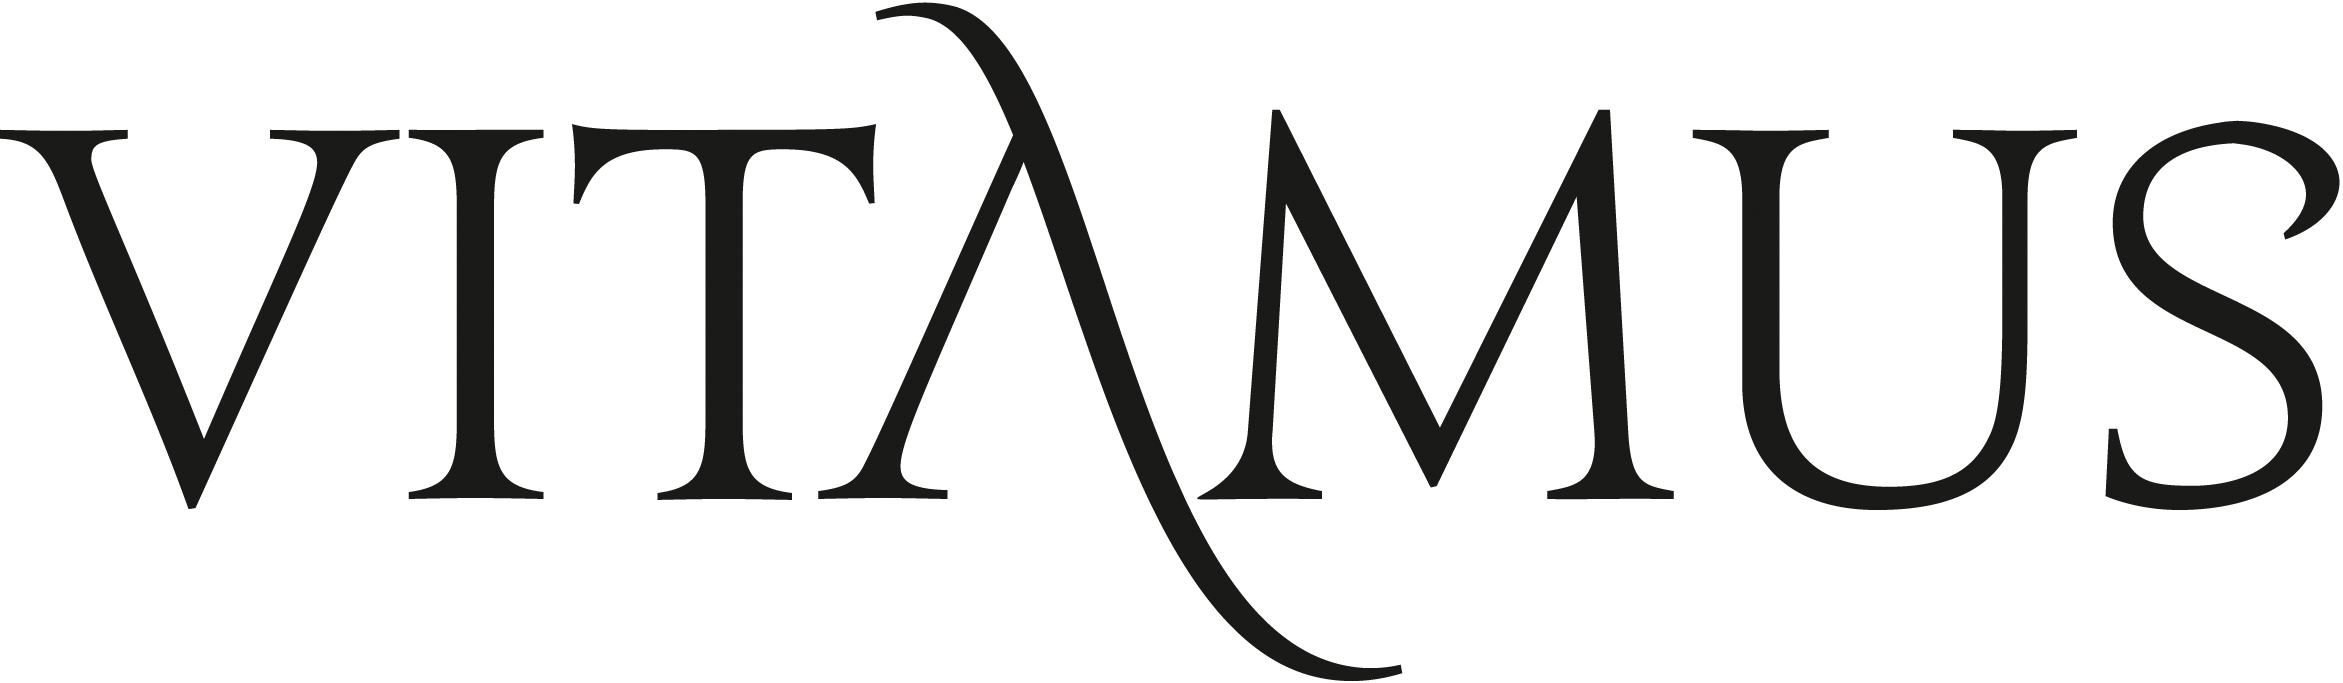 vitamus_logo_300dpi